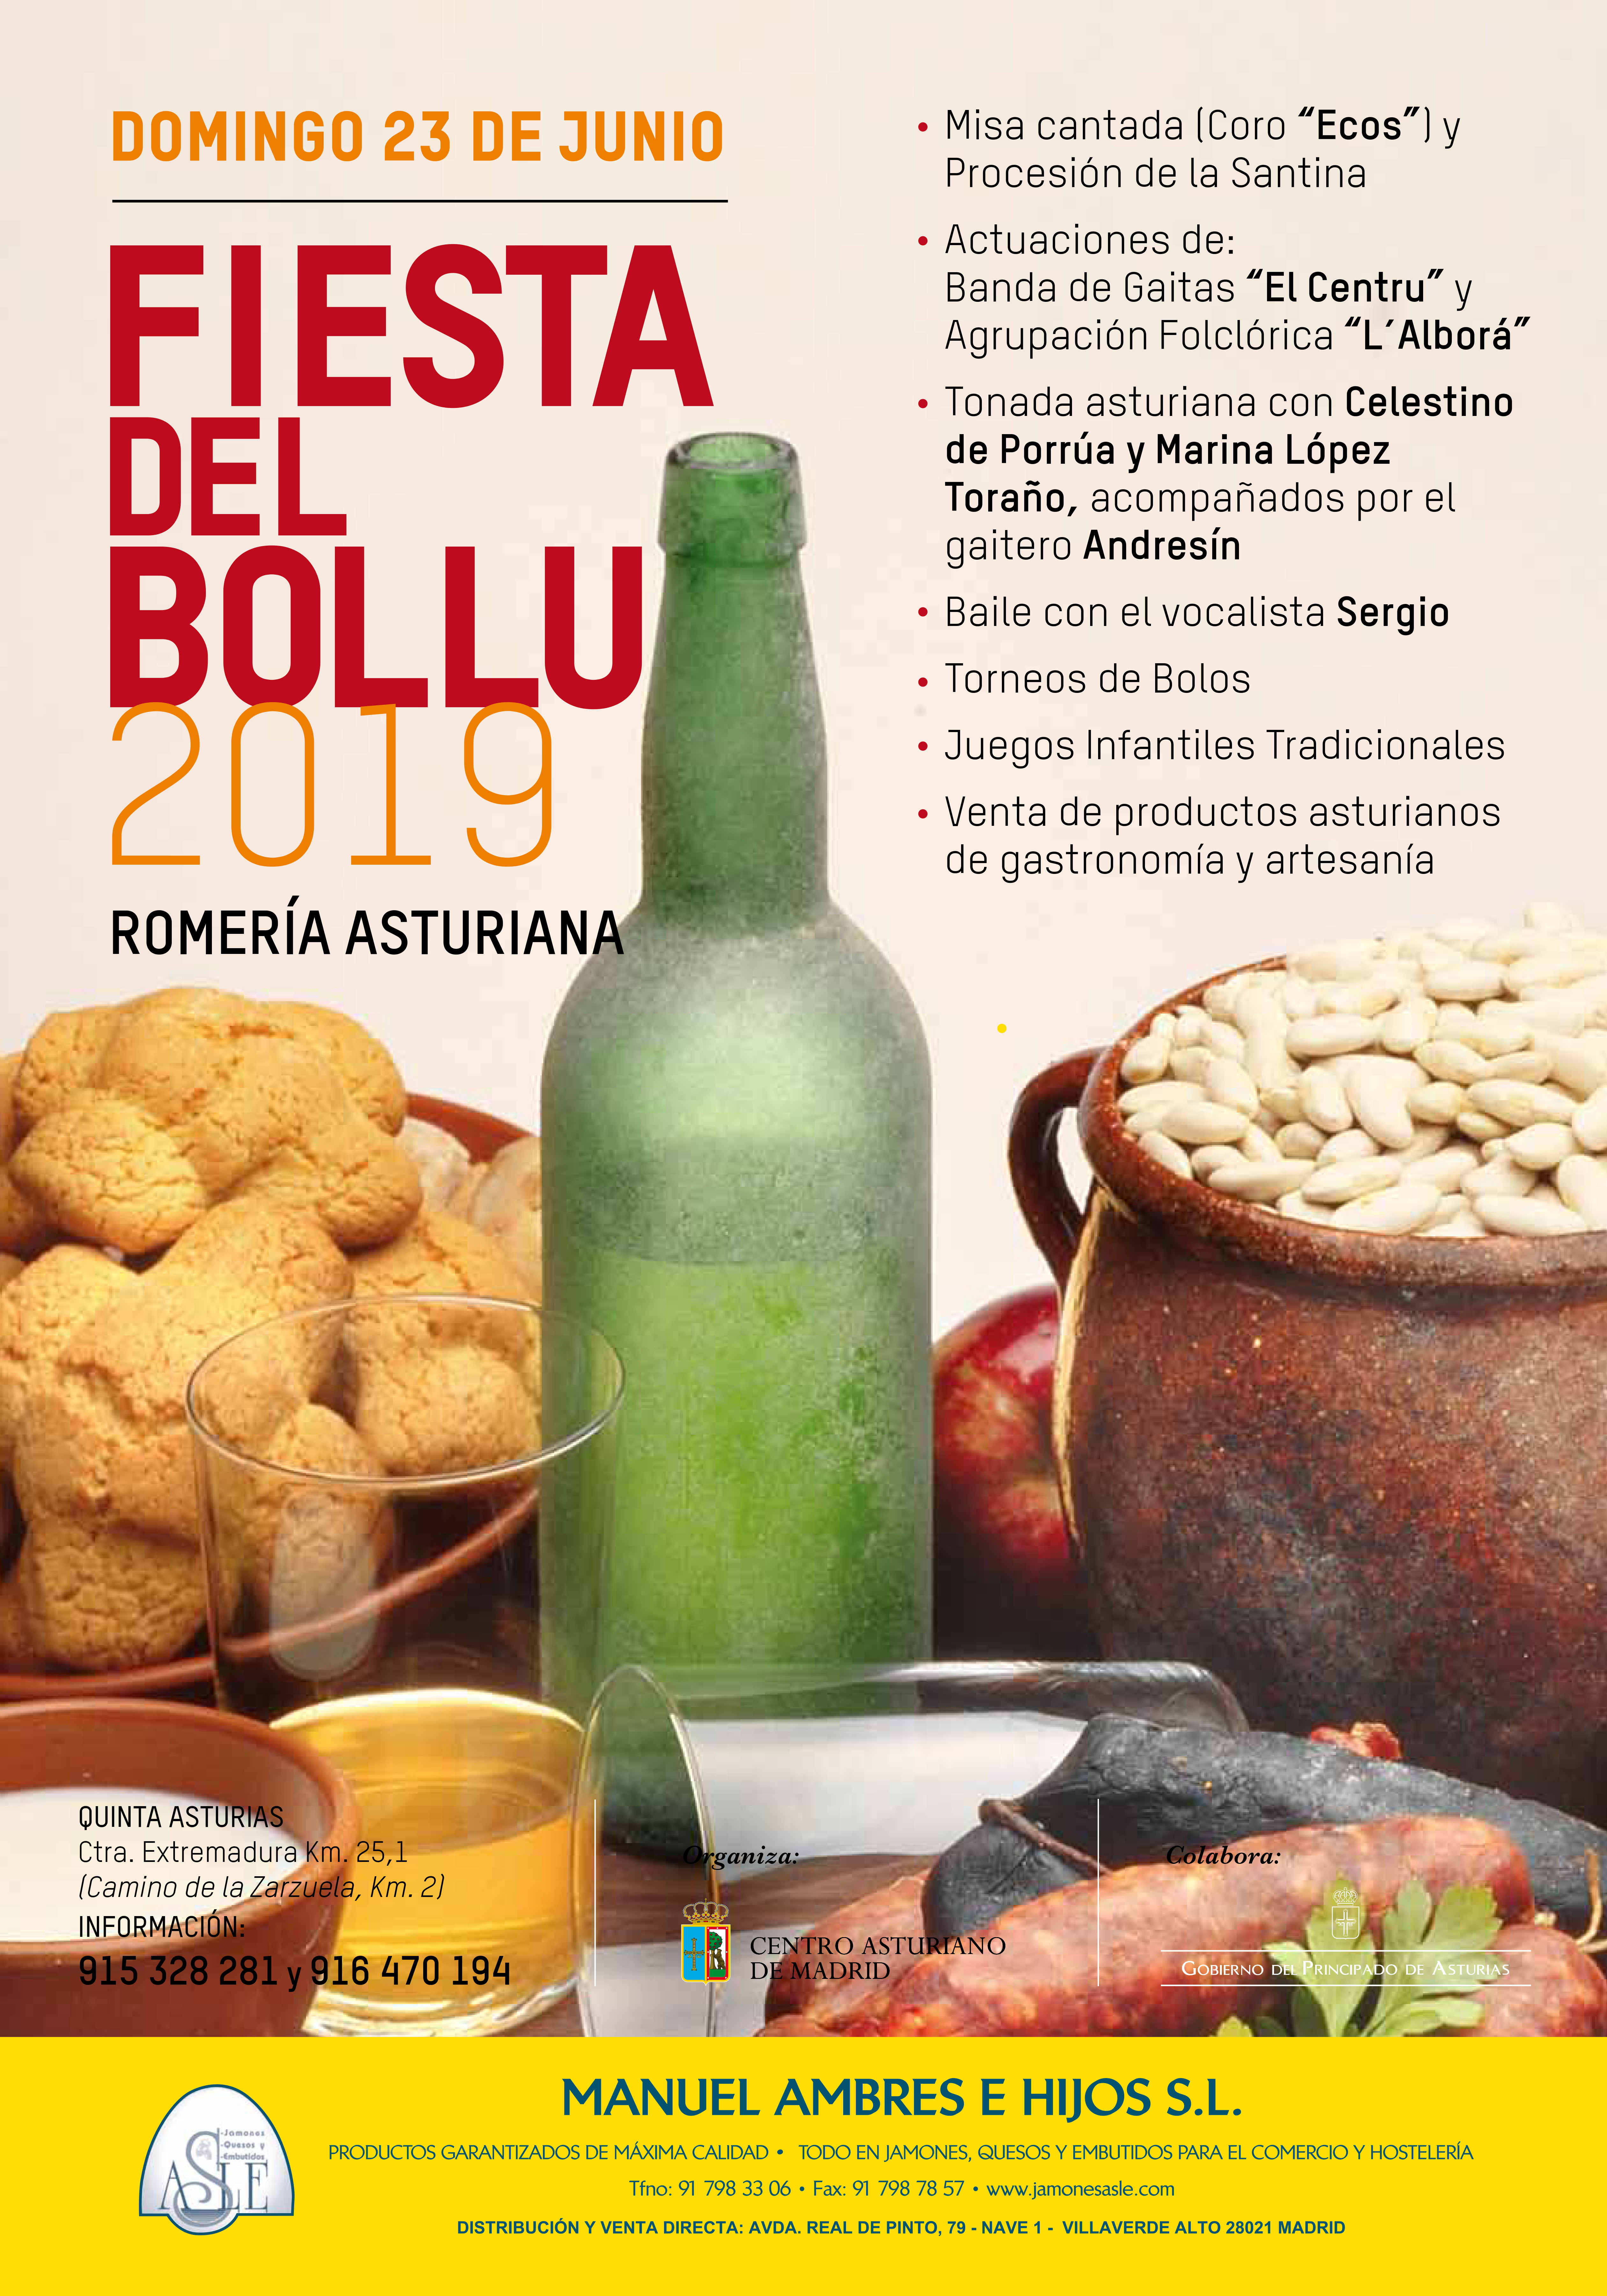 El Centro Asturiano de Madrid celebra la Fiesta del Bollu